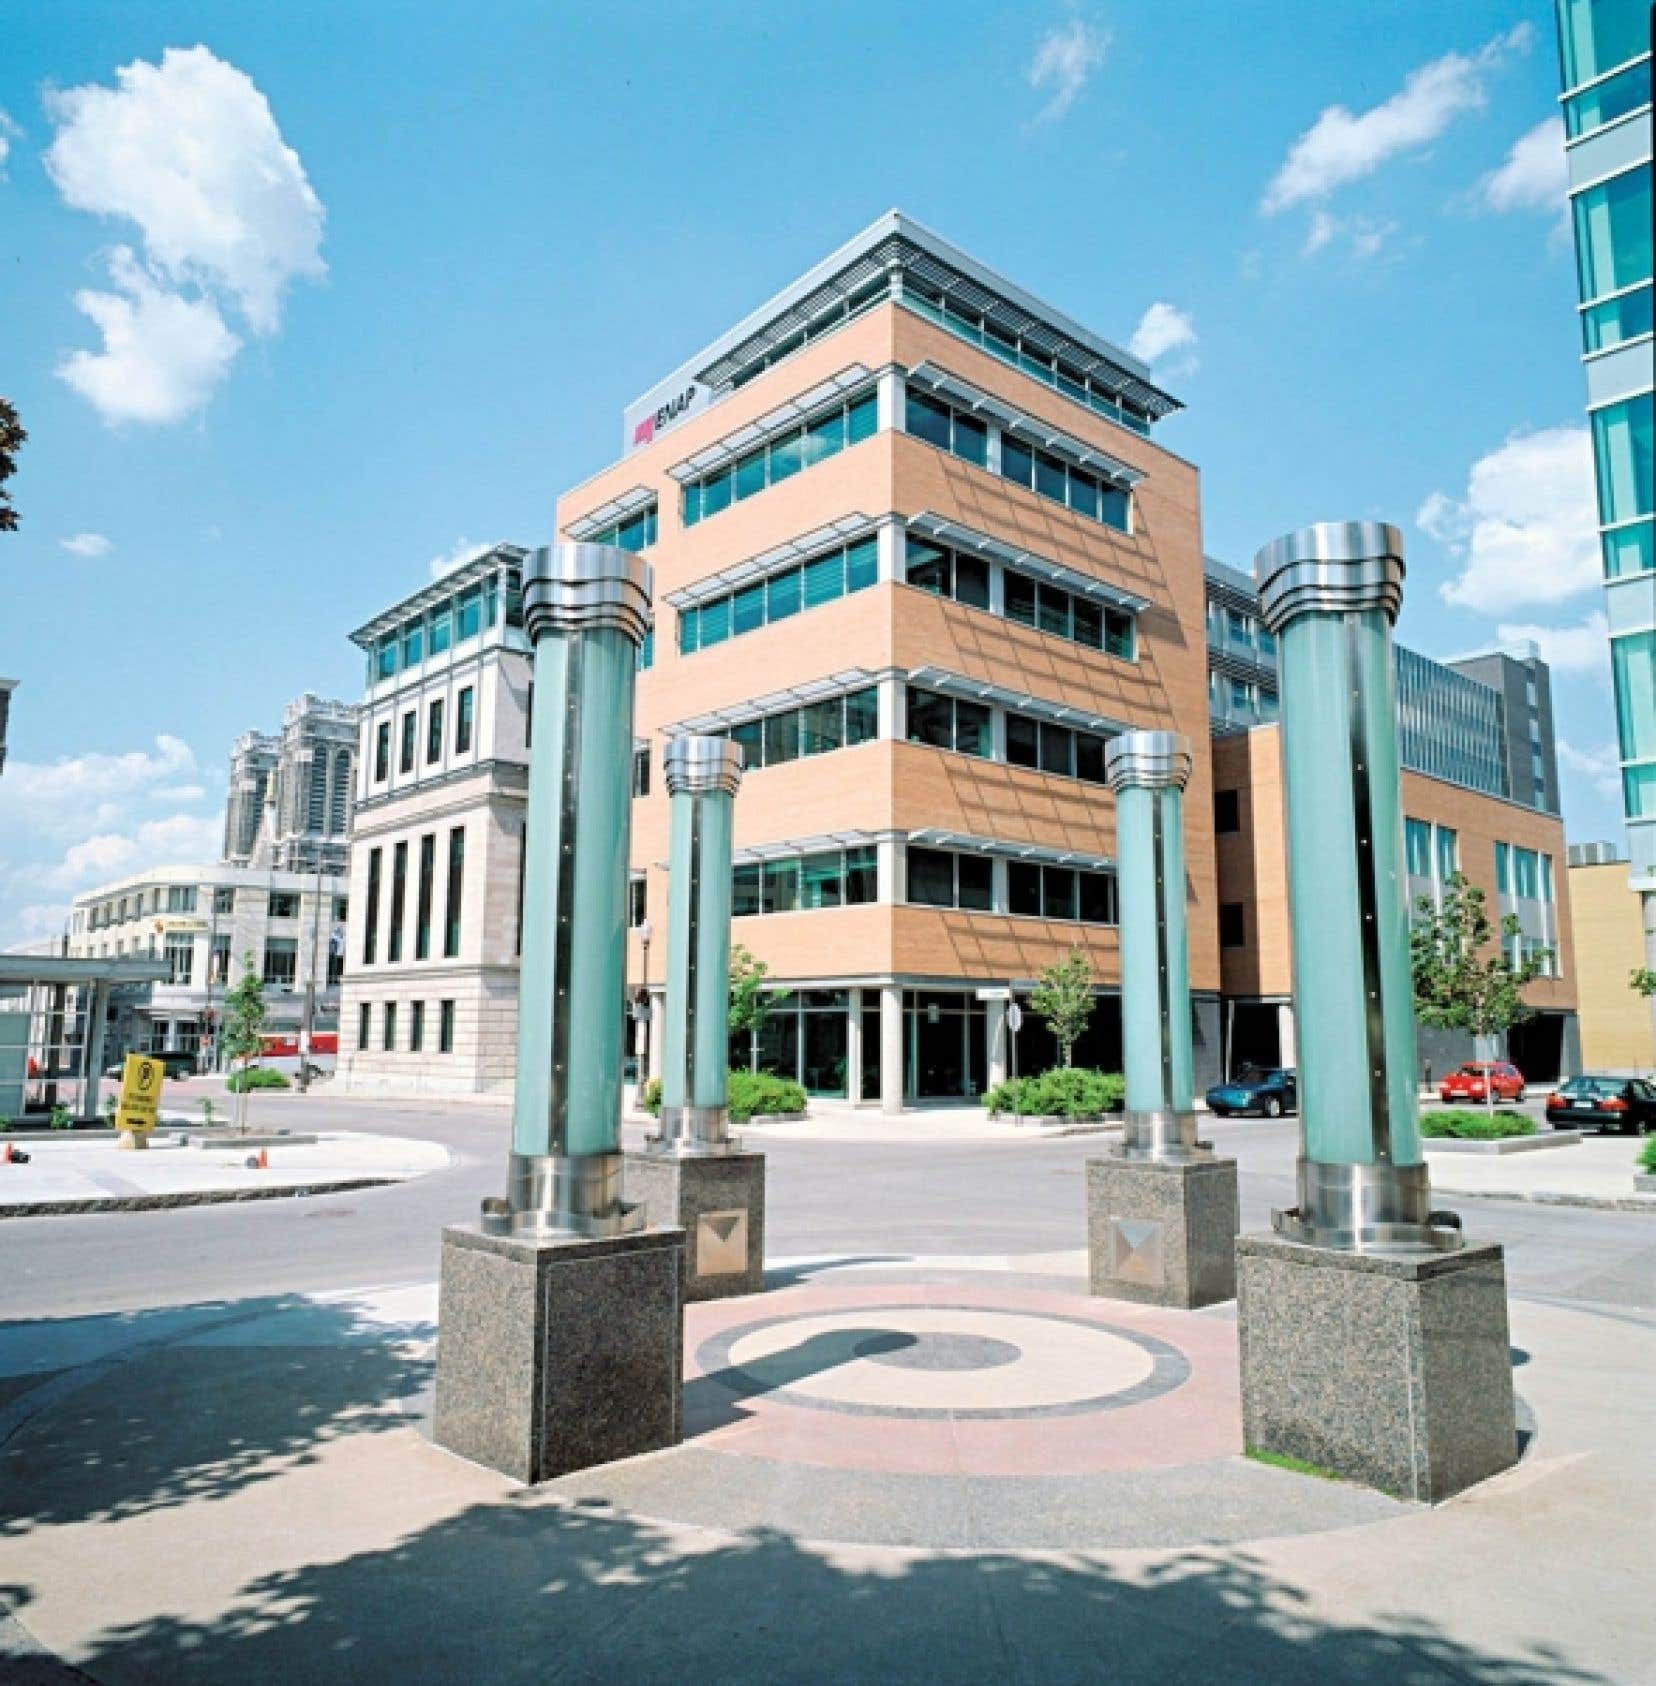 Le siège social de l'ÉNAP à Québec<br />